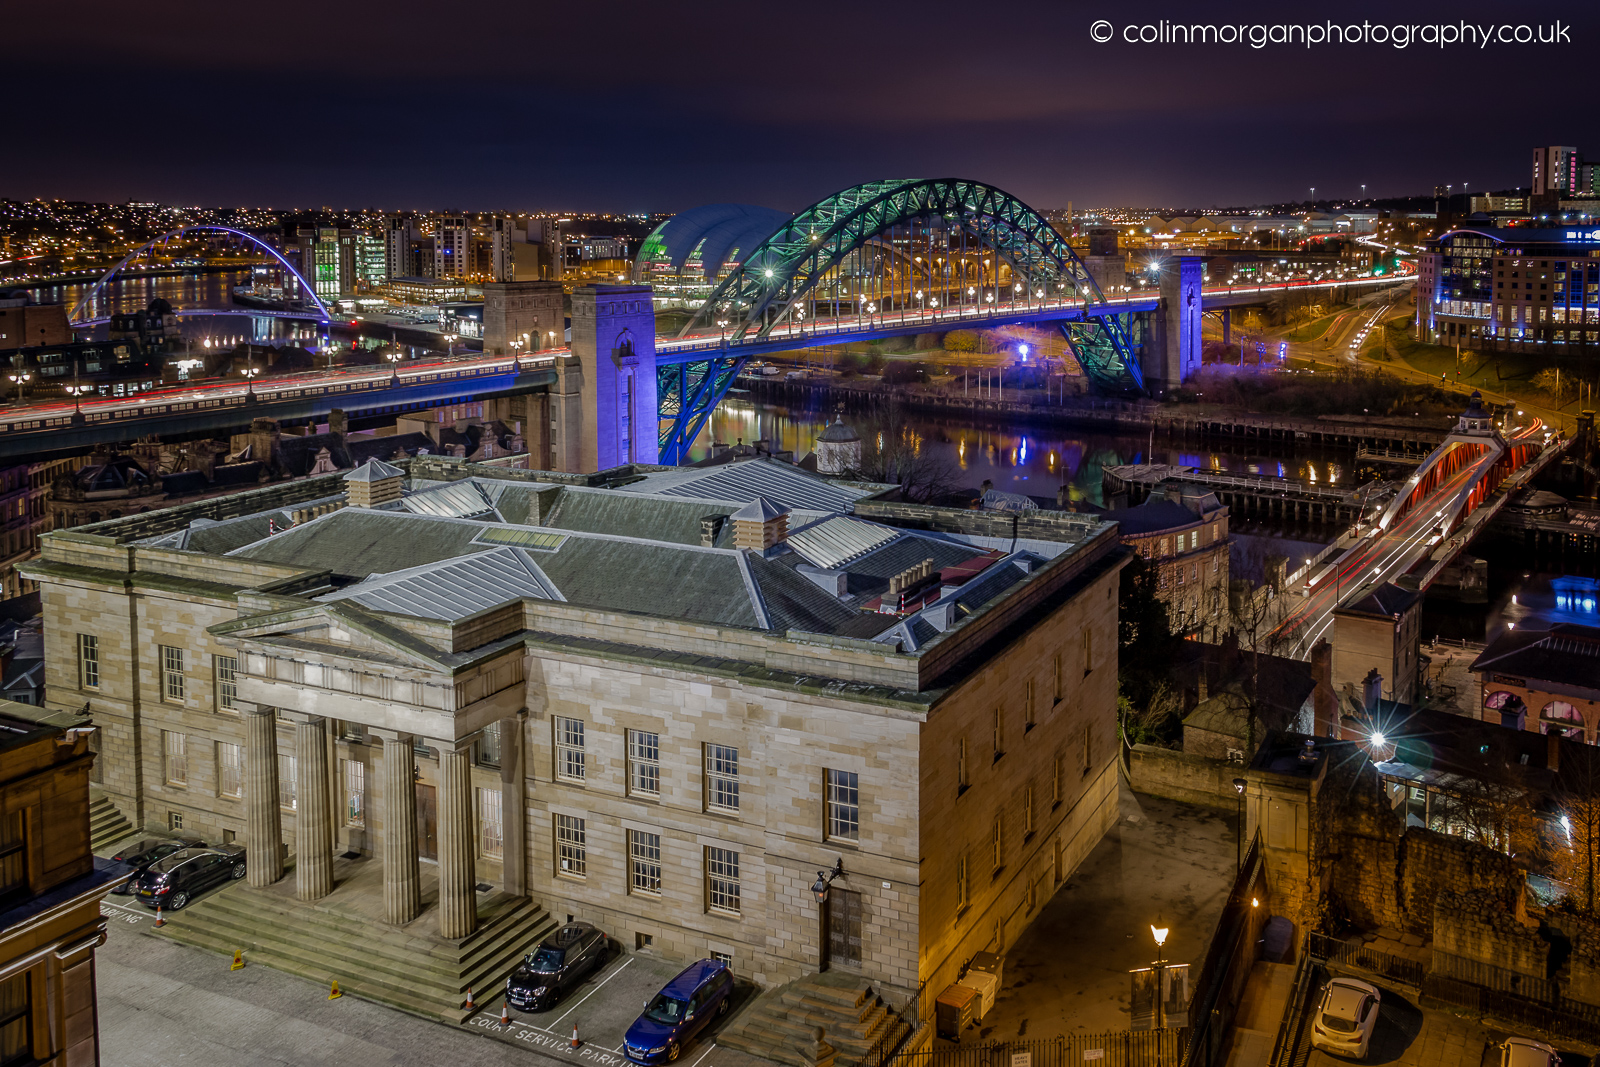 Colin Morgan Photography, Moot Hall and the River Tyne Colin Morgan Photography